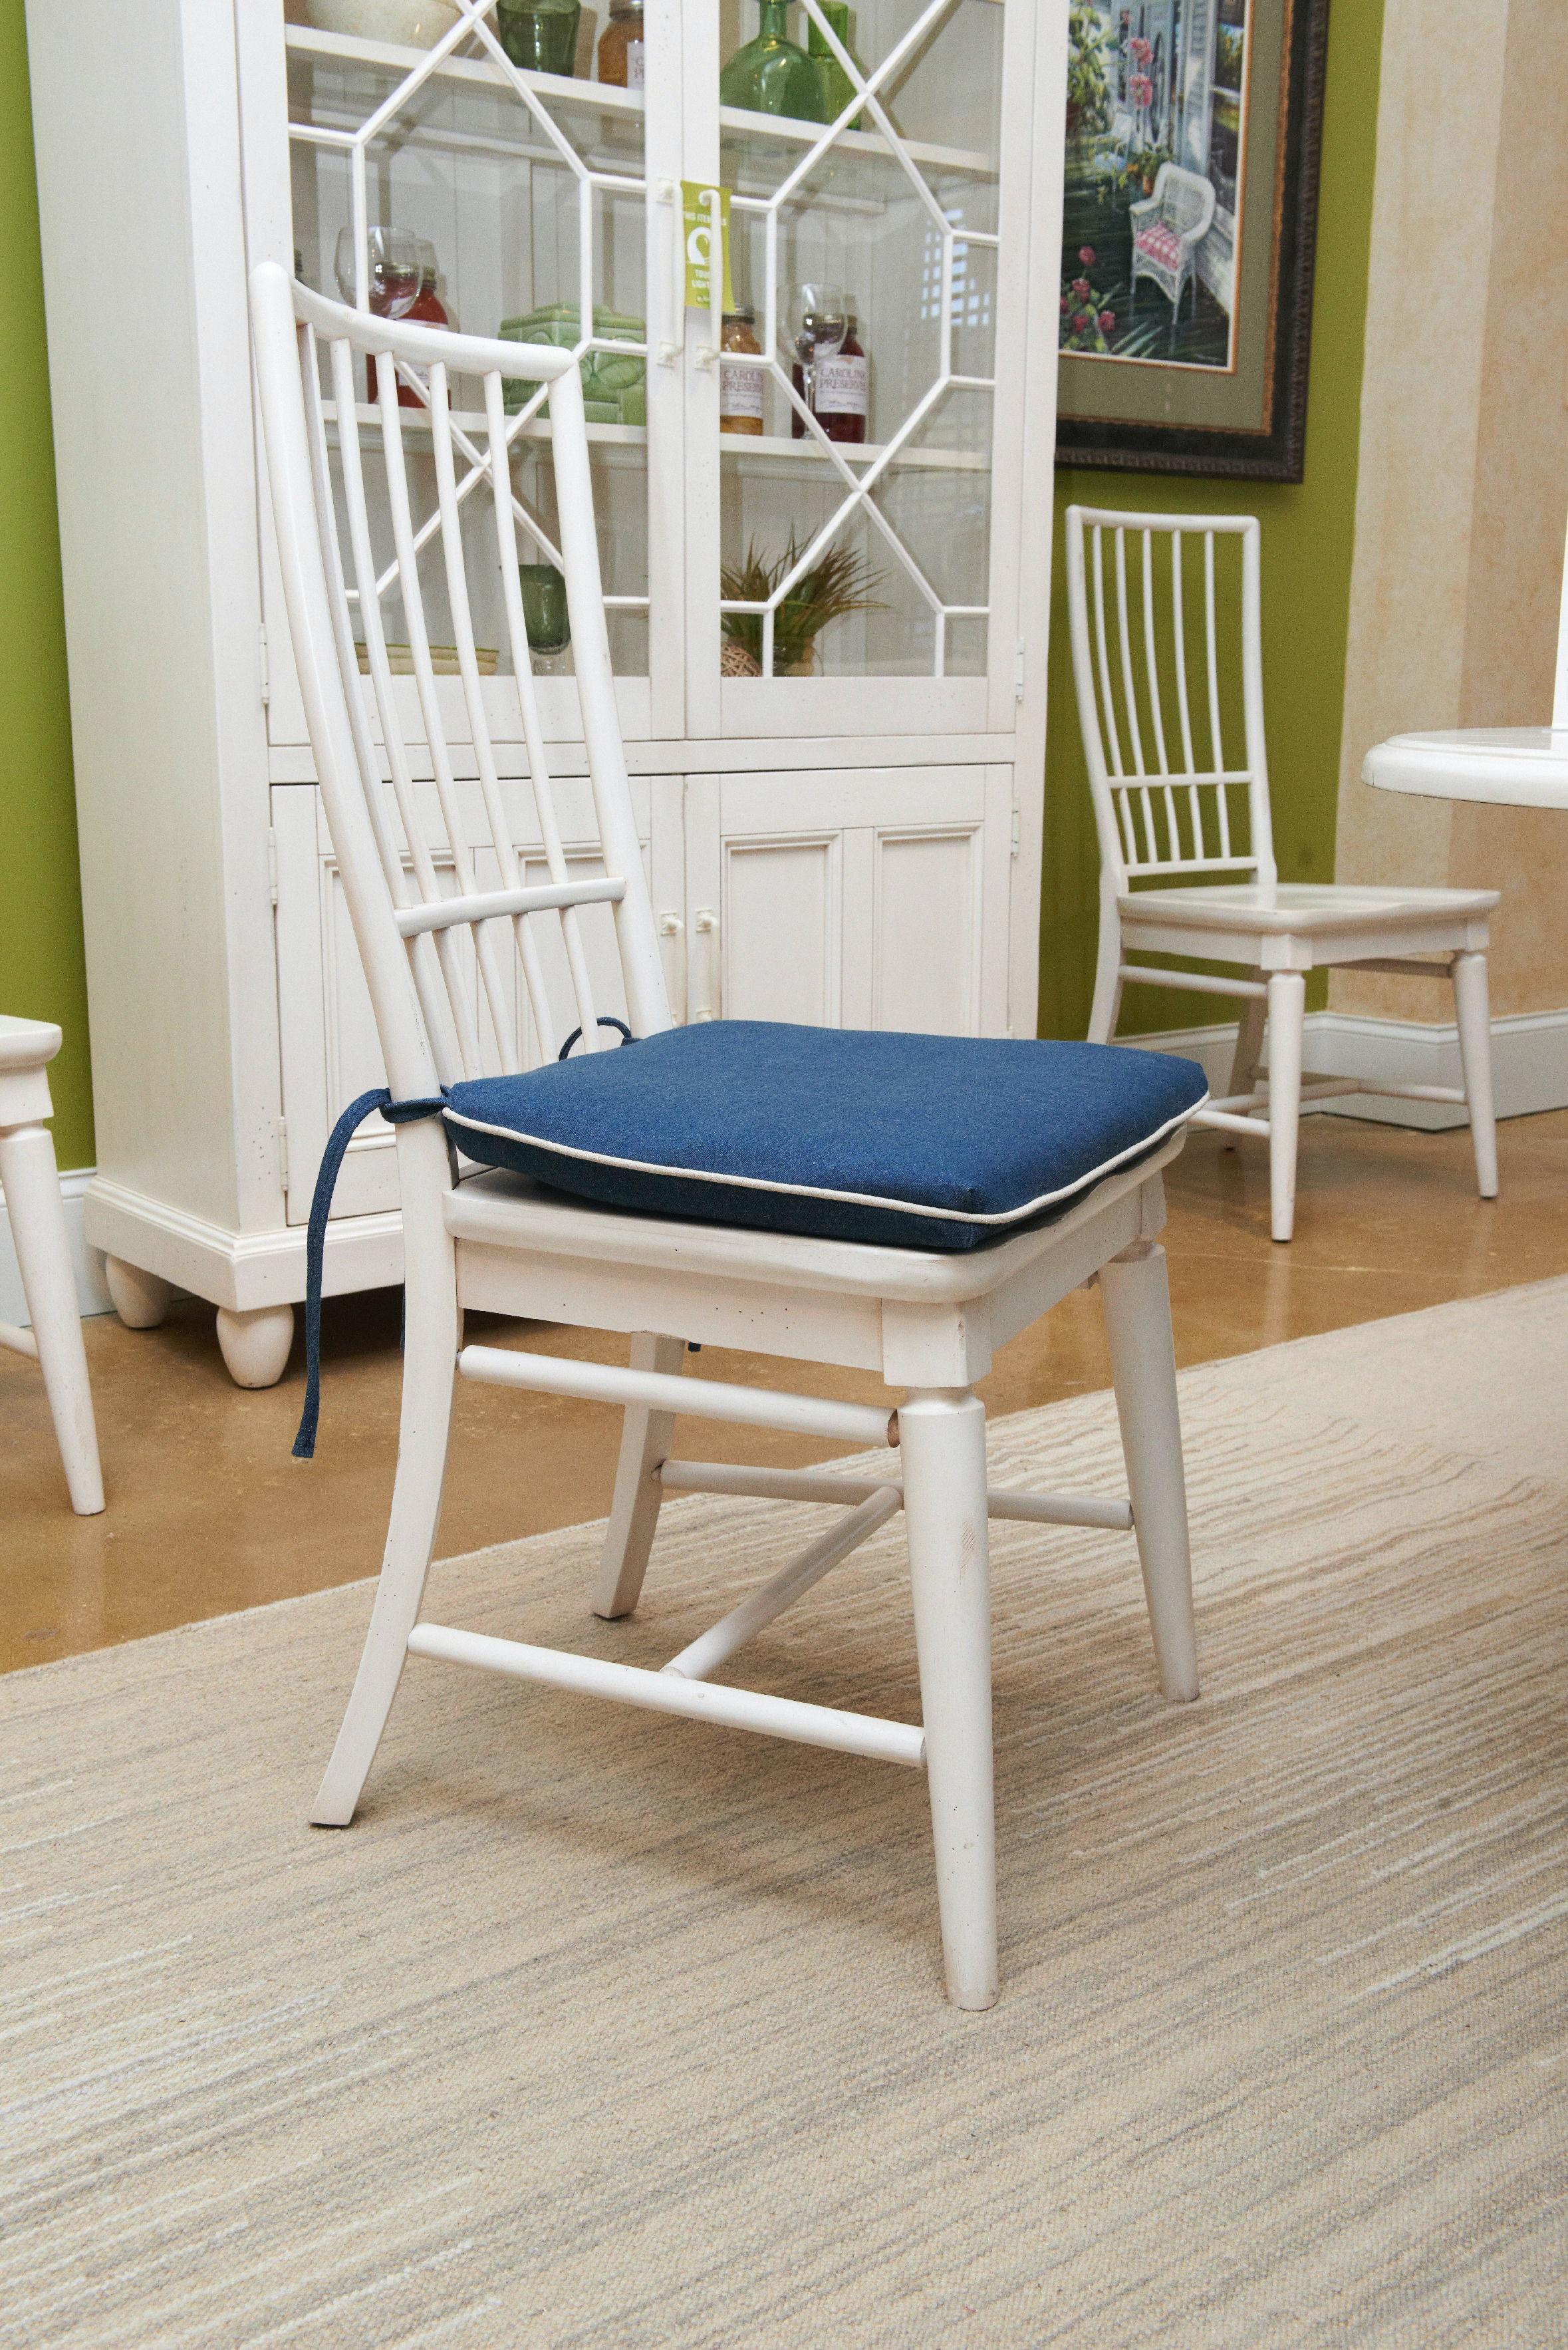 Carolina Preserves Furniture Wrights Furniture & Flooring